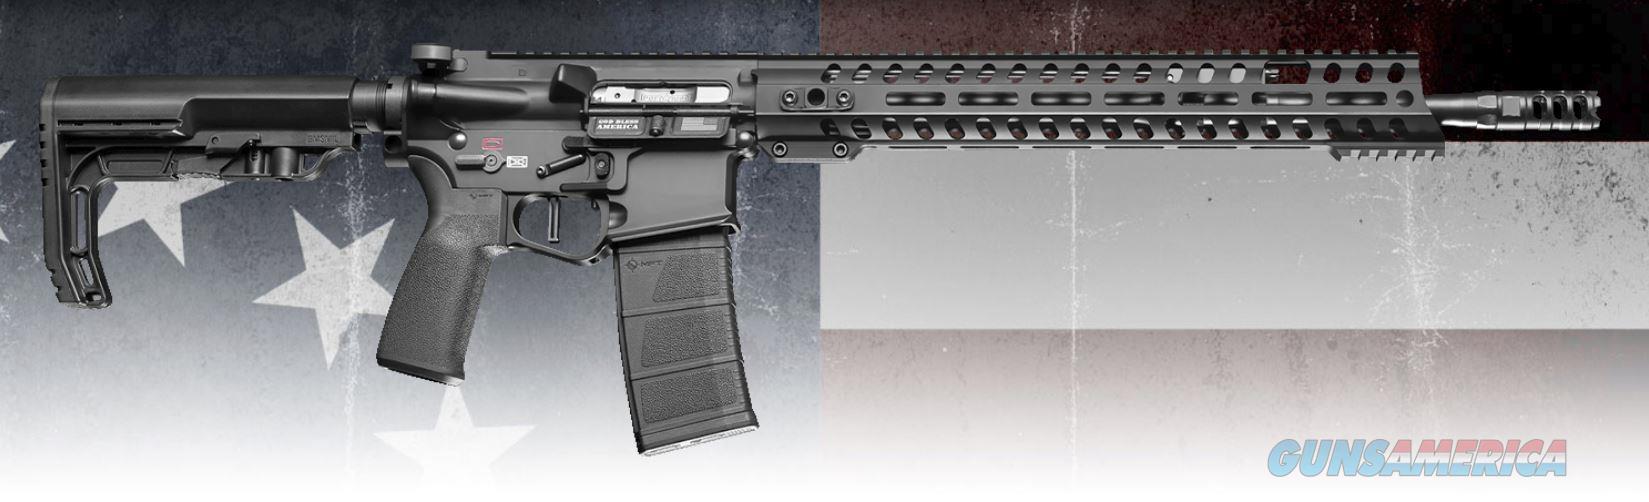 "Patriot Ord Factory Renegade+ 300Blk 16.5"" 01442  Guns > Rifles > PQ Misc Rifles"